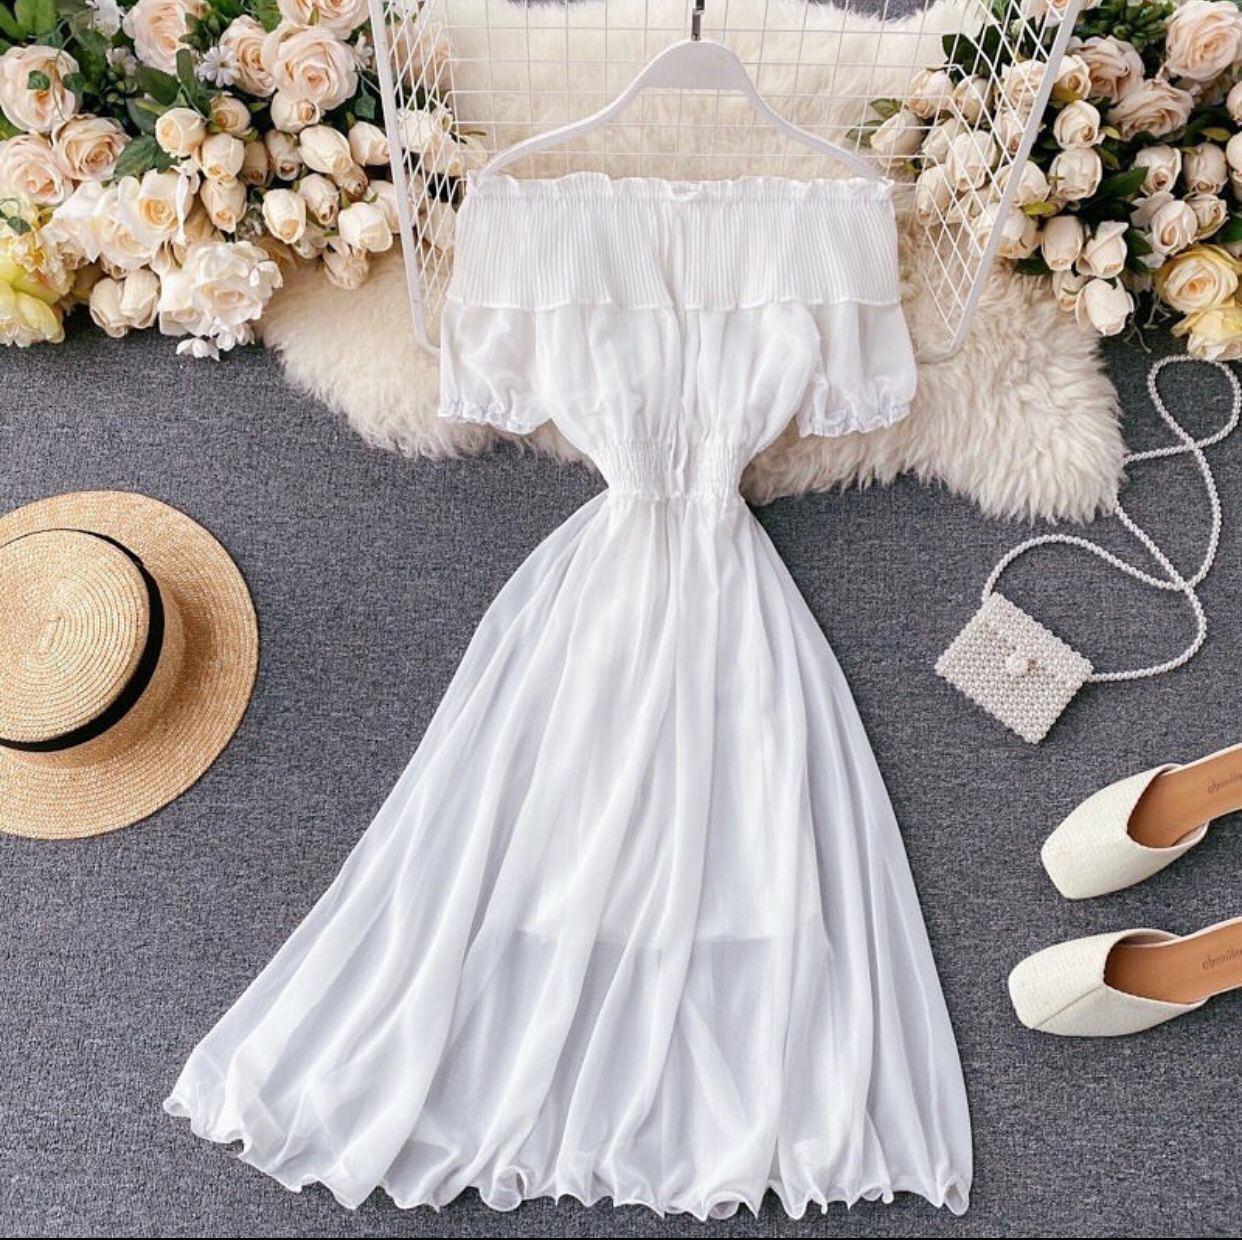 Homecoming Dress 1.jpg